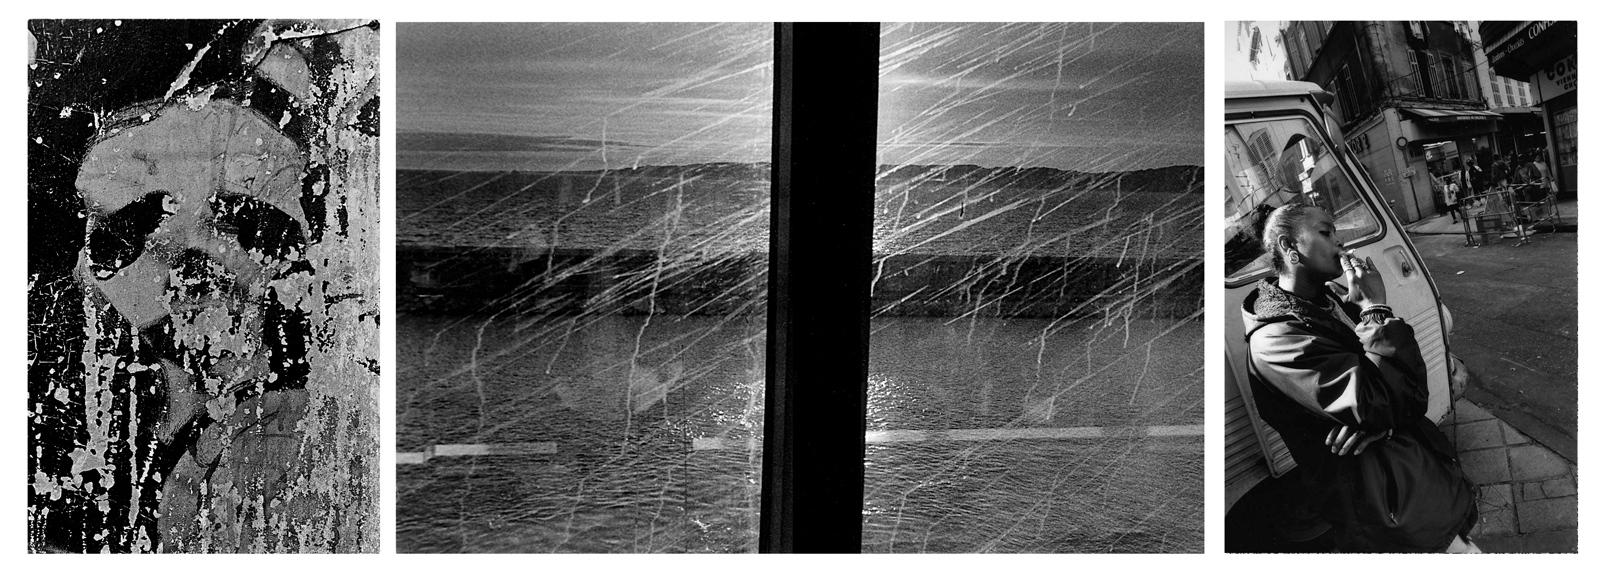 Art and Documentary Photography - Loading 014_Marseille___Fabio_Sgroi.jpg